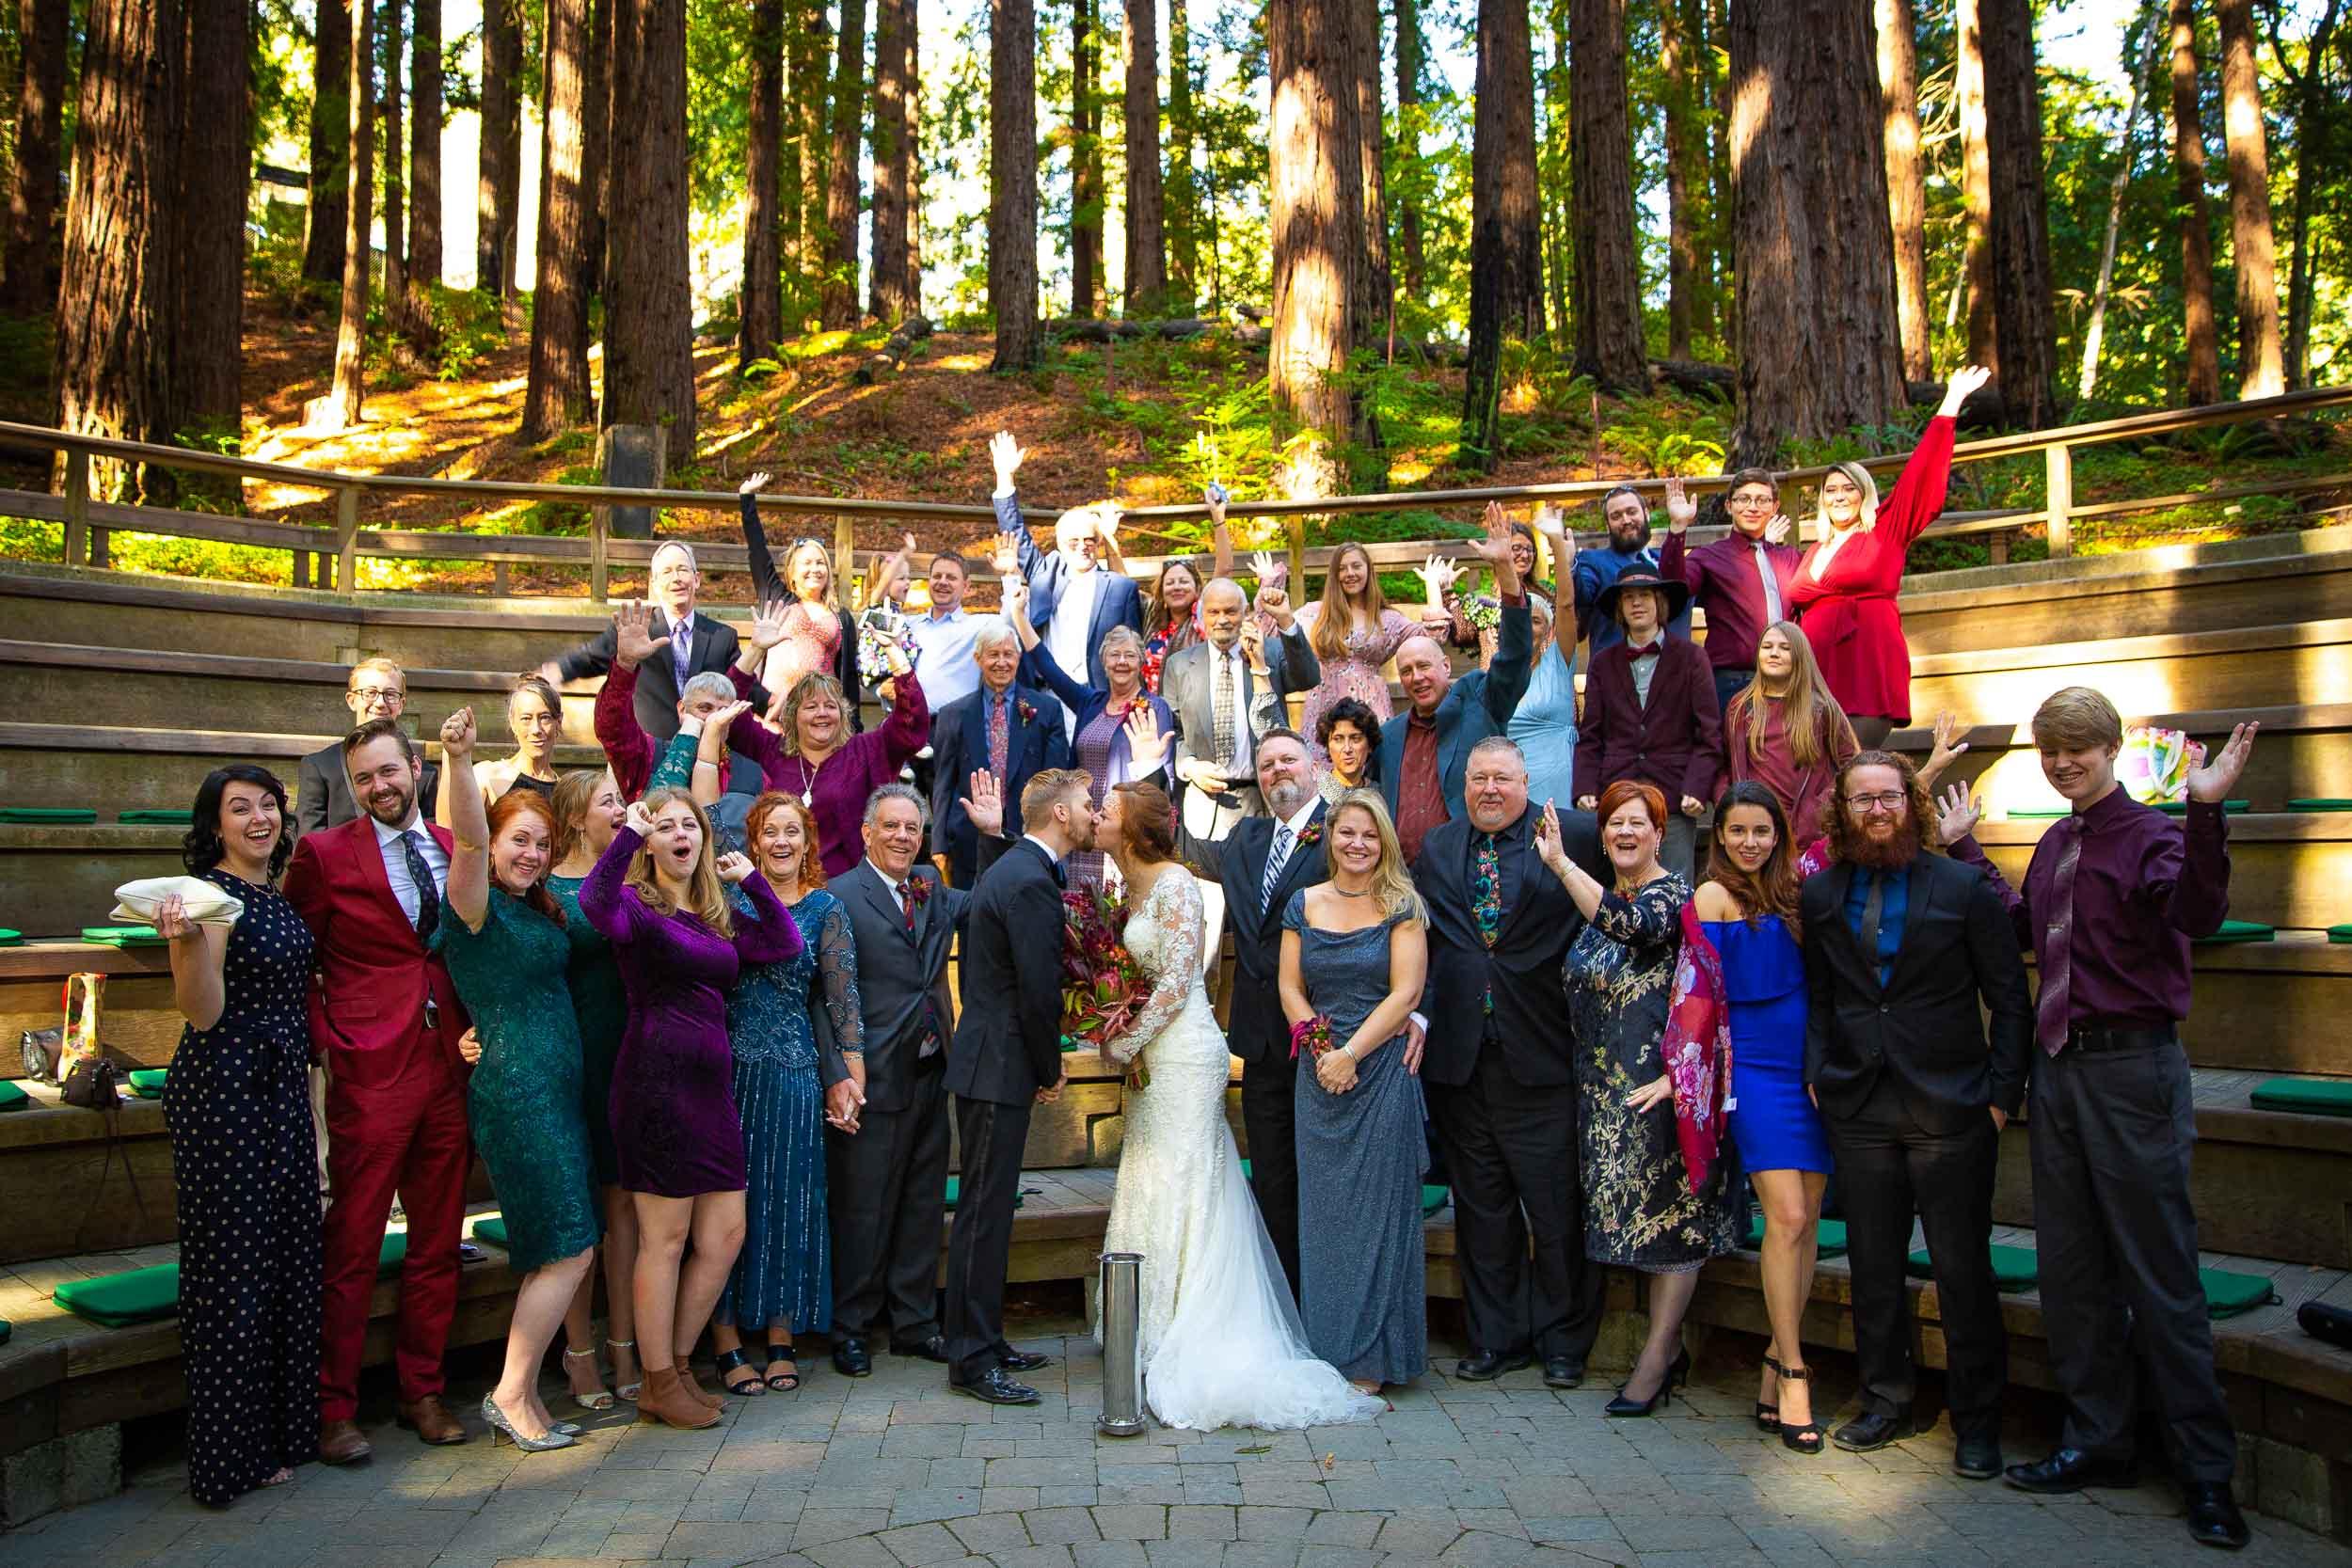 Berkeley Botanical Garden Wedding Ceremony in the Redwood Grove Ceremony and SF Bay Wedding Cruise Reception-44.jpg